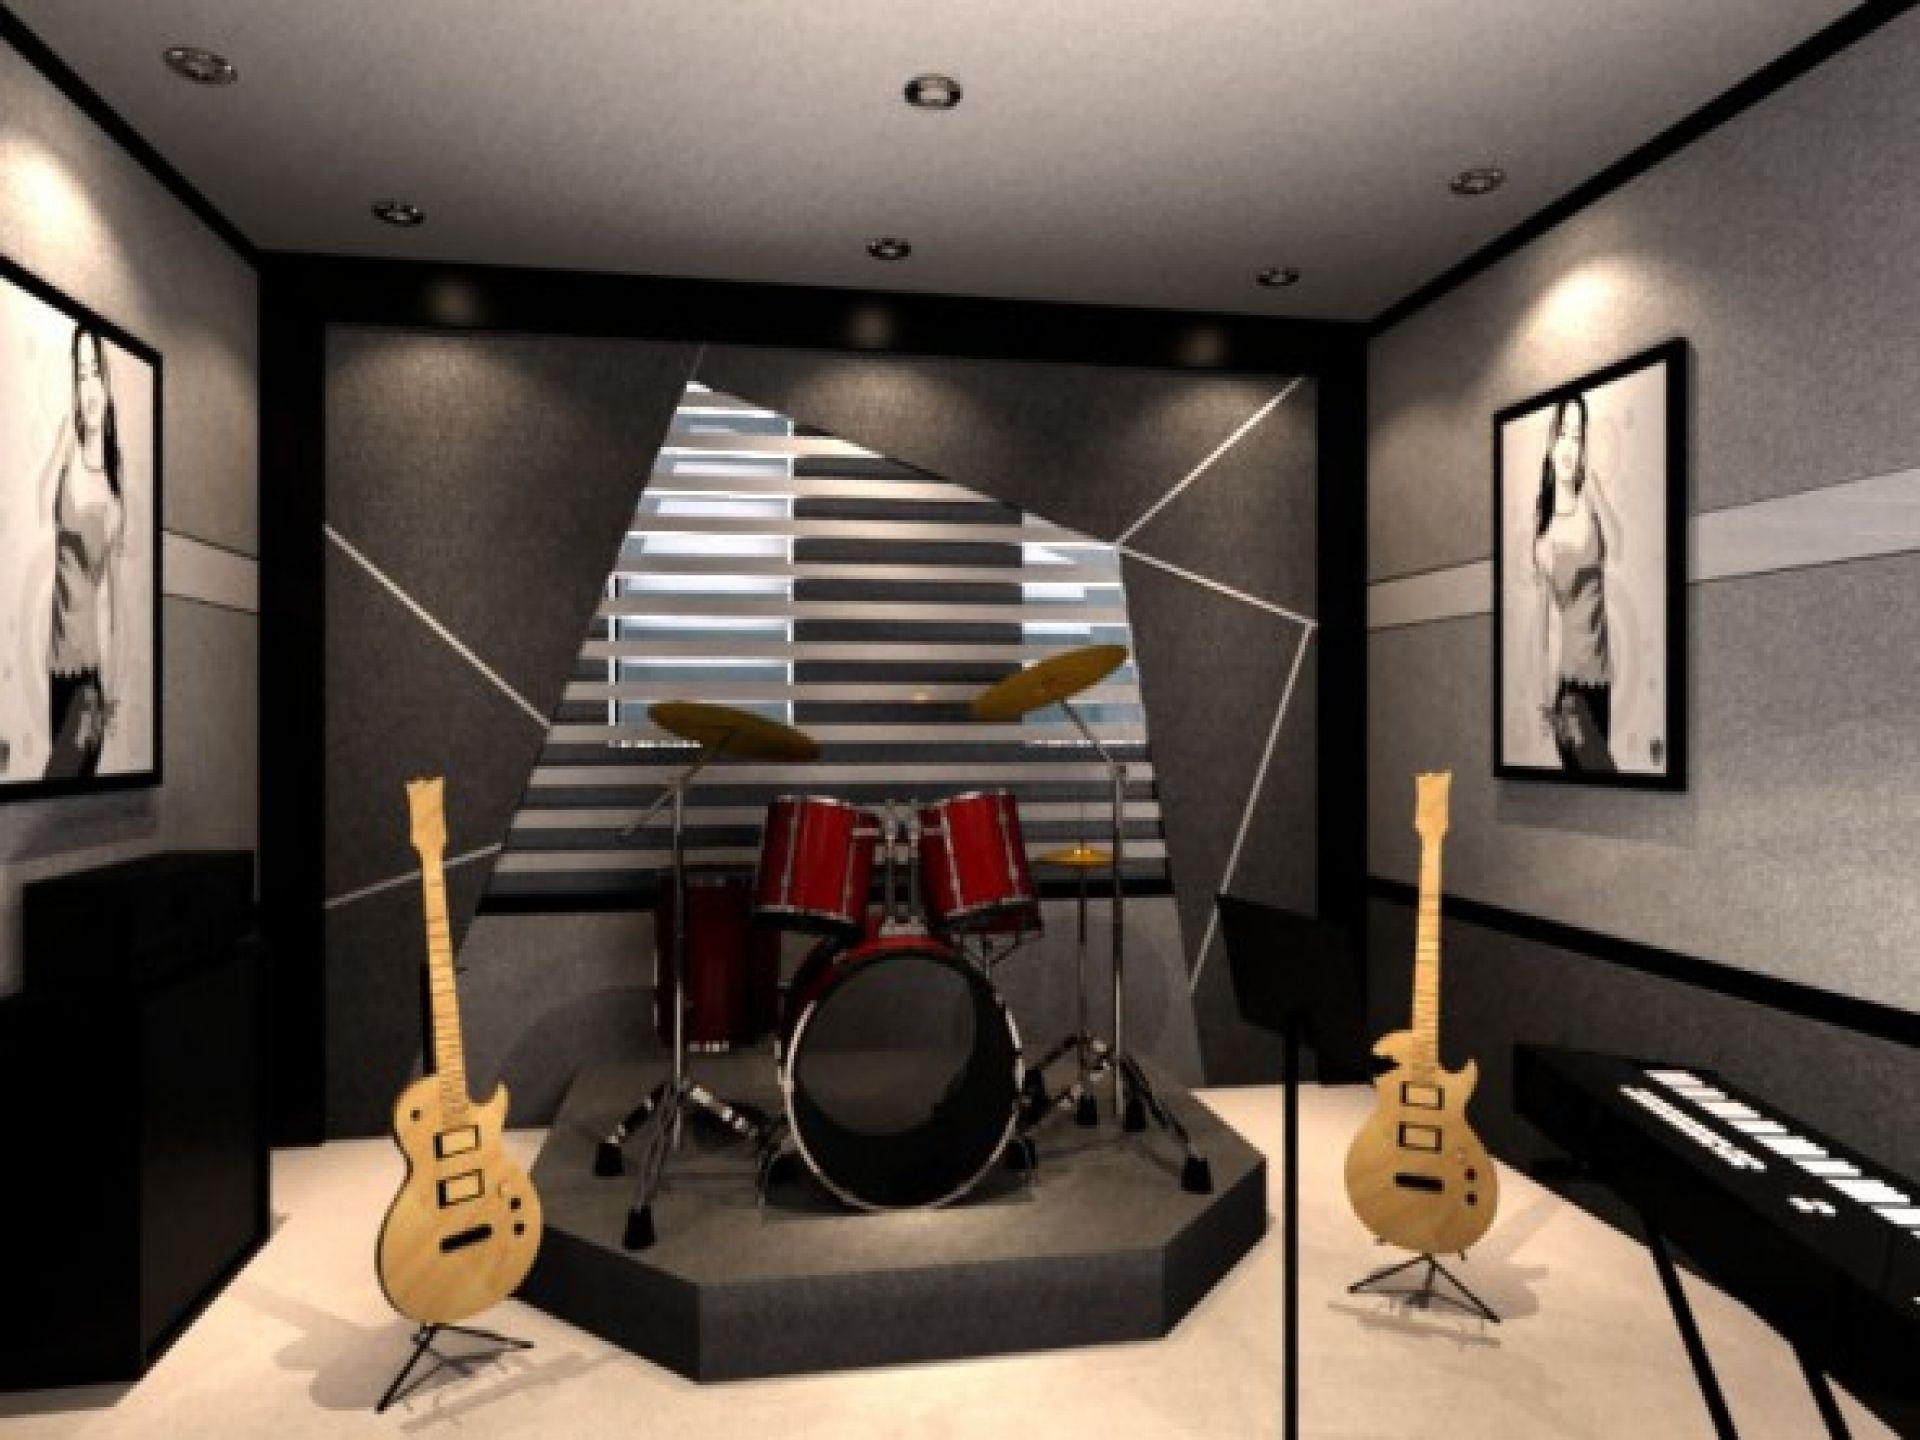 Best Kitchen Gallery: Home Music Studio Room Google Search Dream Design Inspirations of Home Music Studio Design  on rachelxblog.com